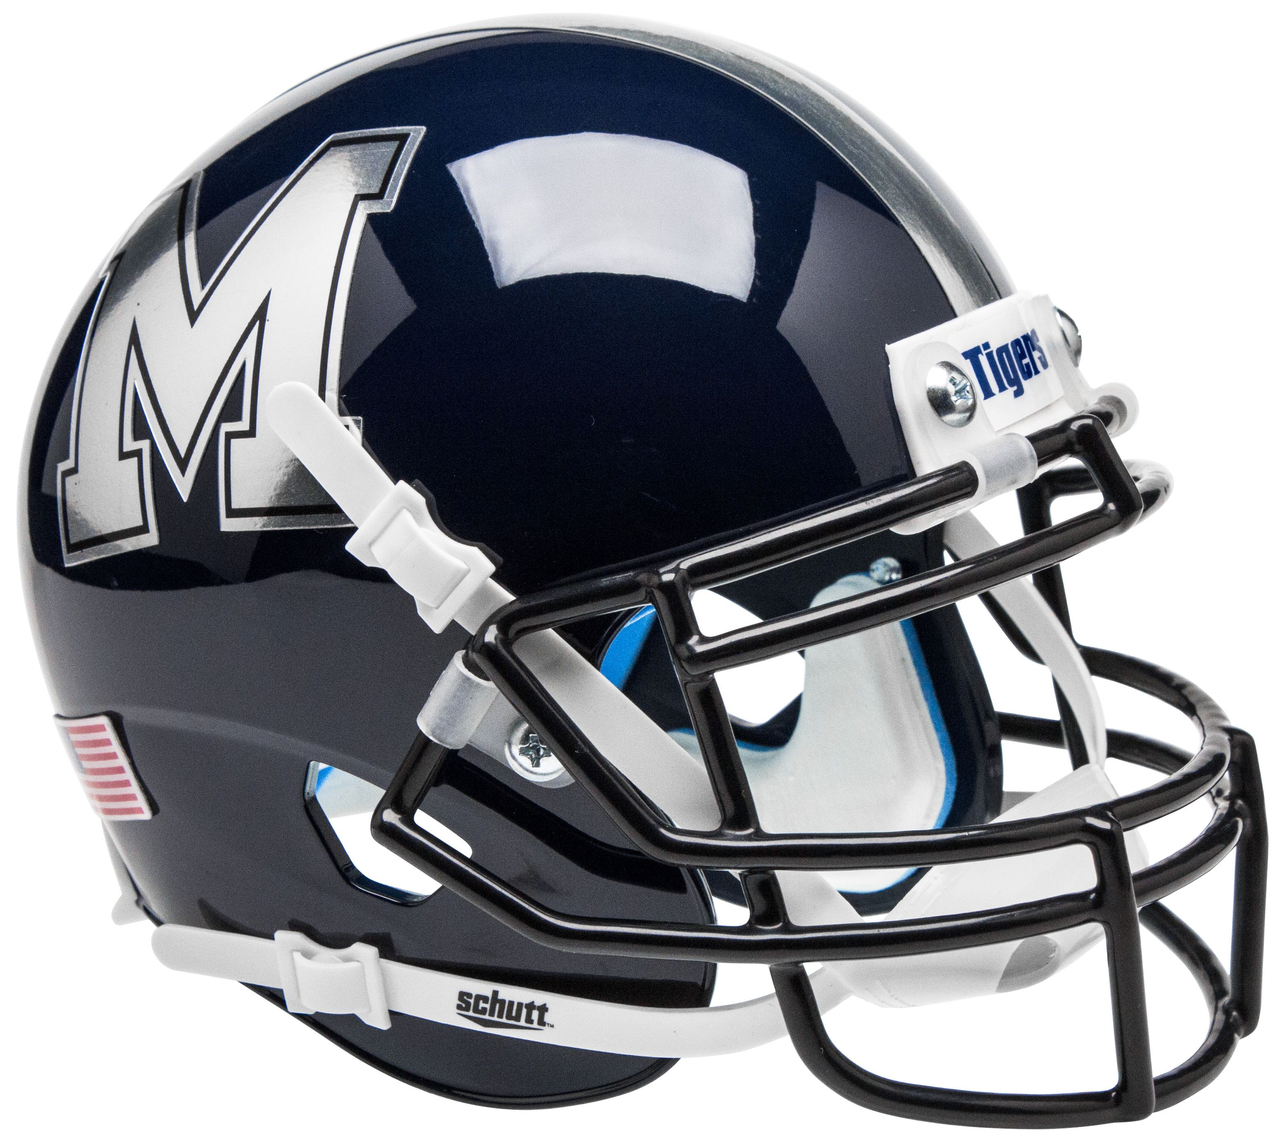 Memphis Tigers Ncaa Schutt Xp Blue With Chrome Logo Full Size Replica Football Helmet Football Helmets Memphis Tigers Mini Football Helmet